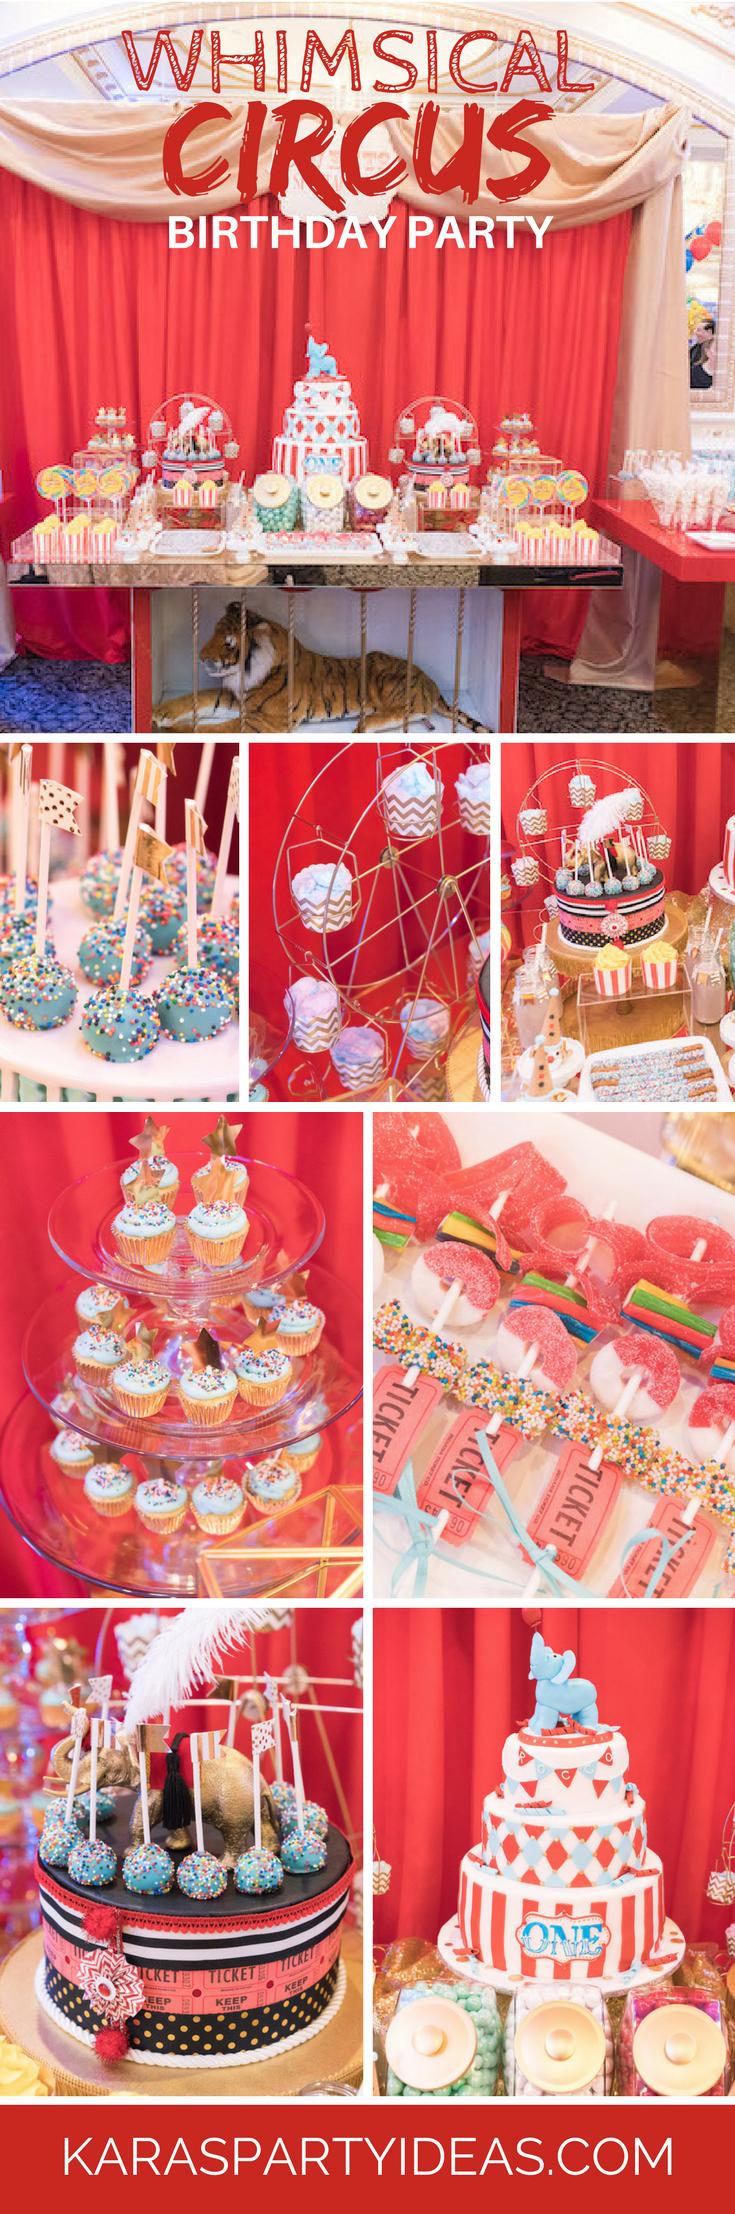 Whimsical Circus Birthday Party - Kara's Party Ideas via KarasPartyIdeas.com